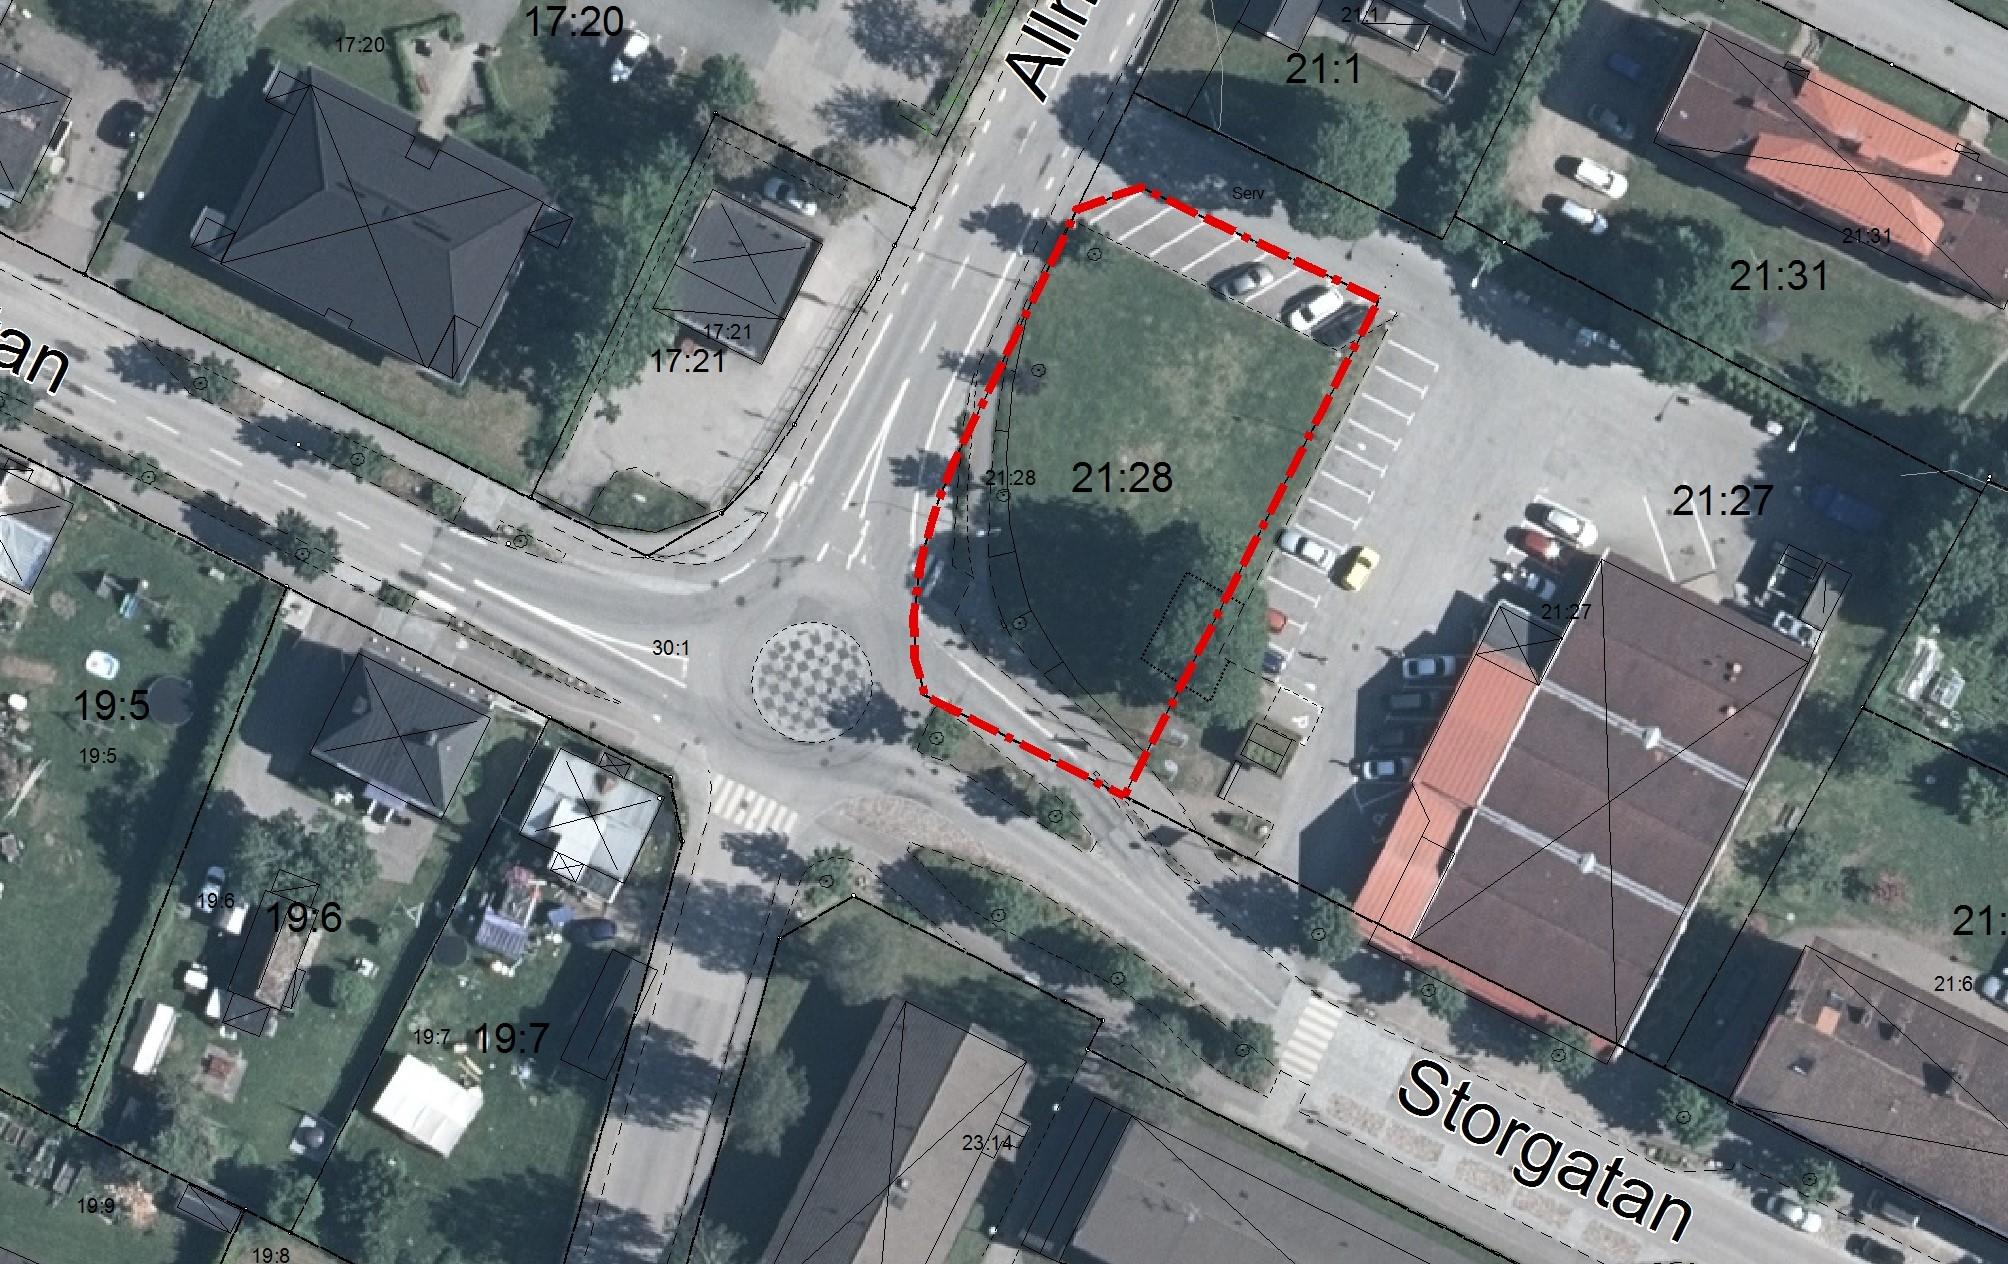 Nyinflyttade p Fabriksgatan 49, Vislanda | satisfaction-survey.net